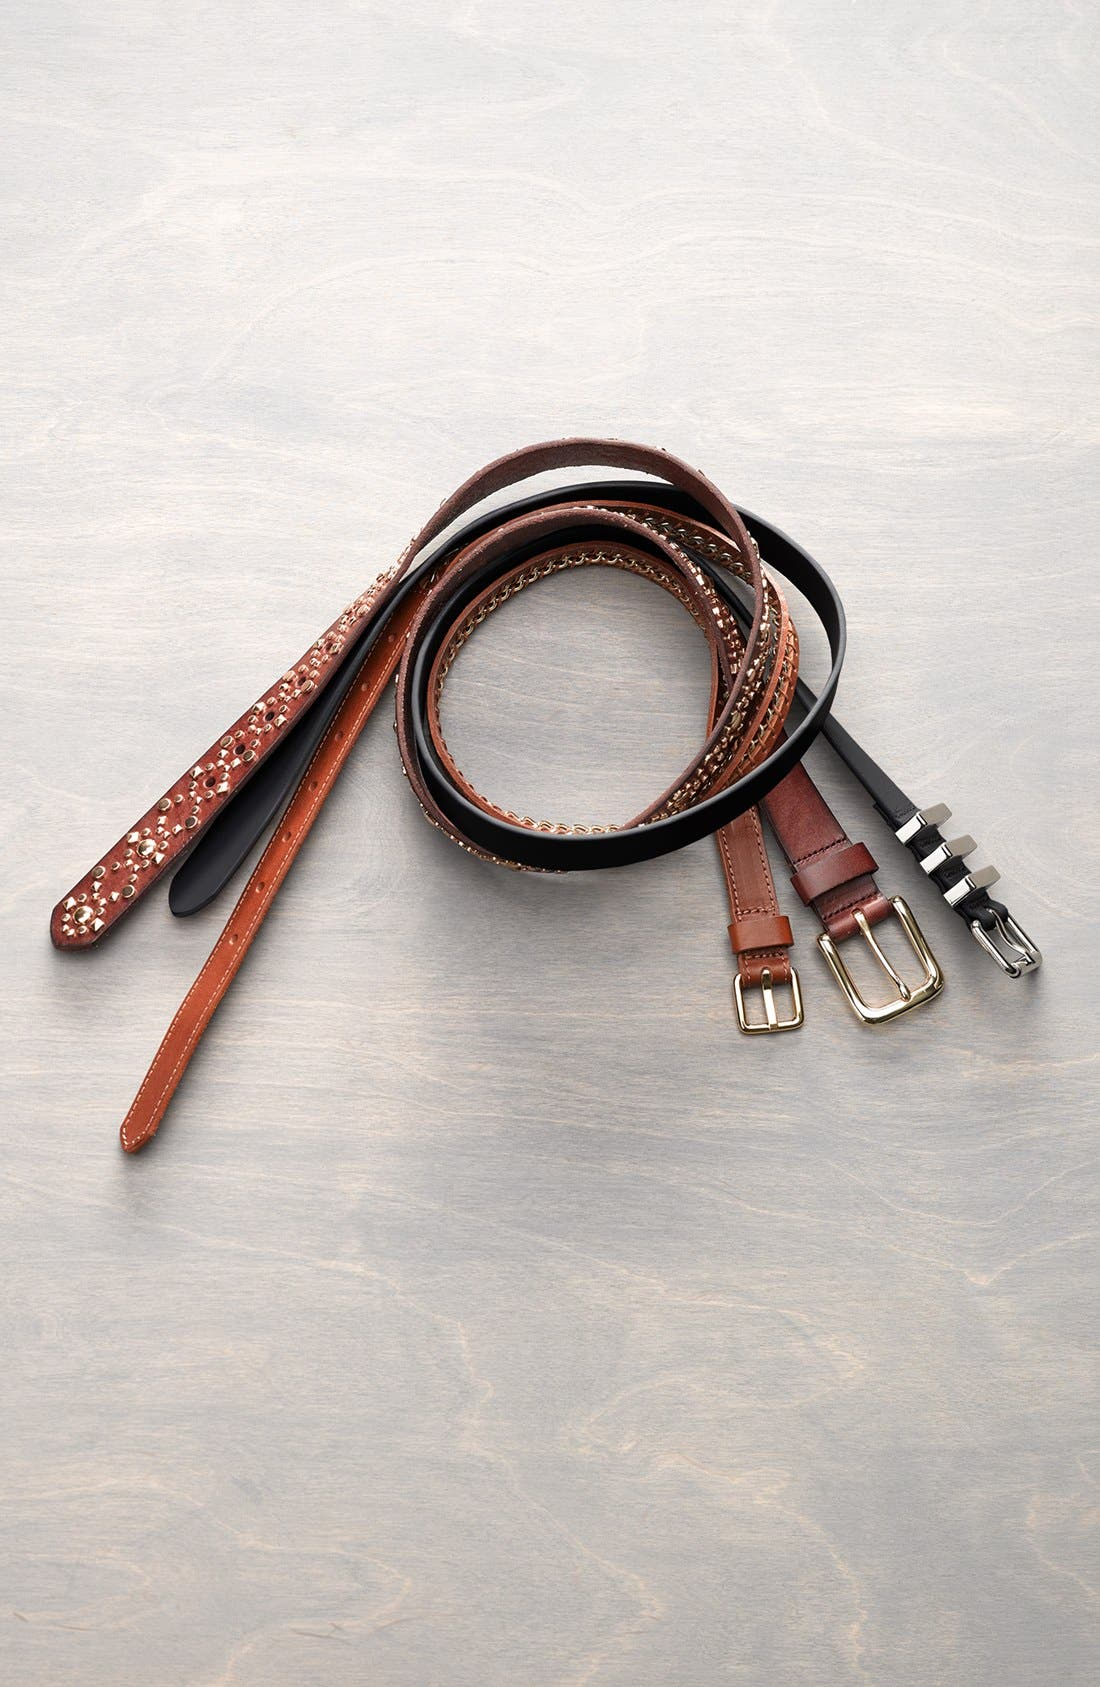 REBECCA MINKOFF, Suzy Leather Belt, Alternate thumbnail 3, color, LUGGAGE